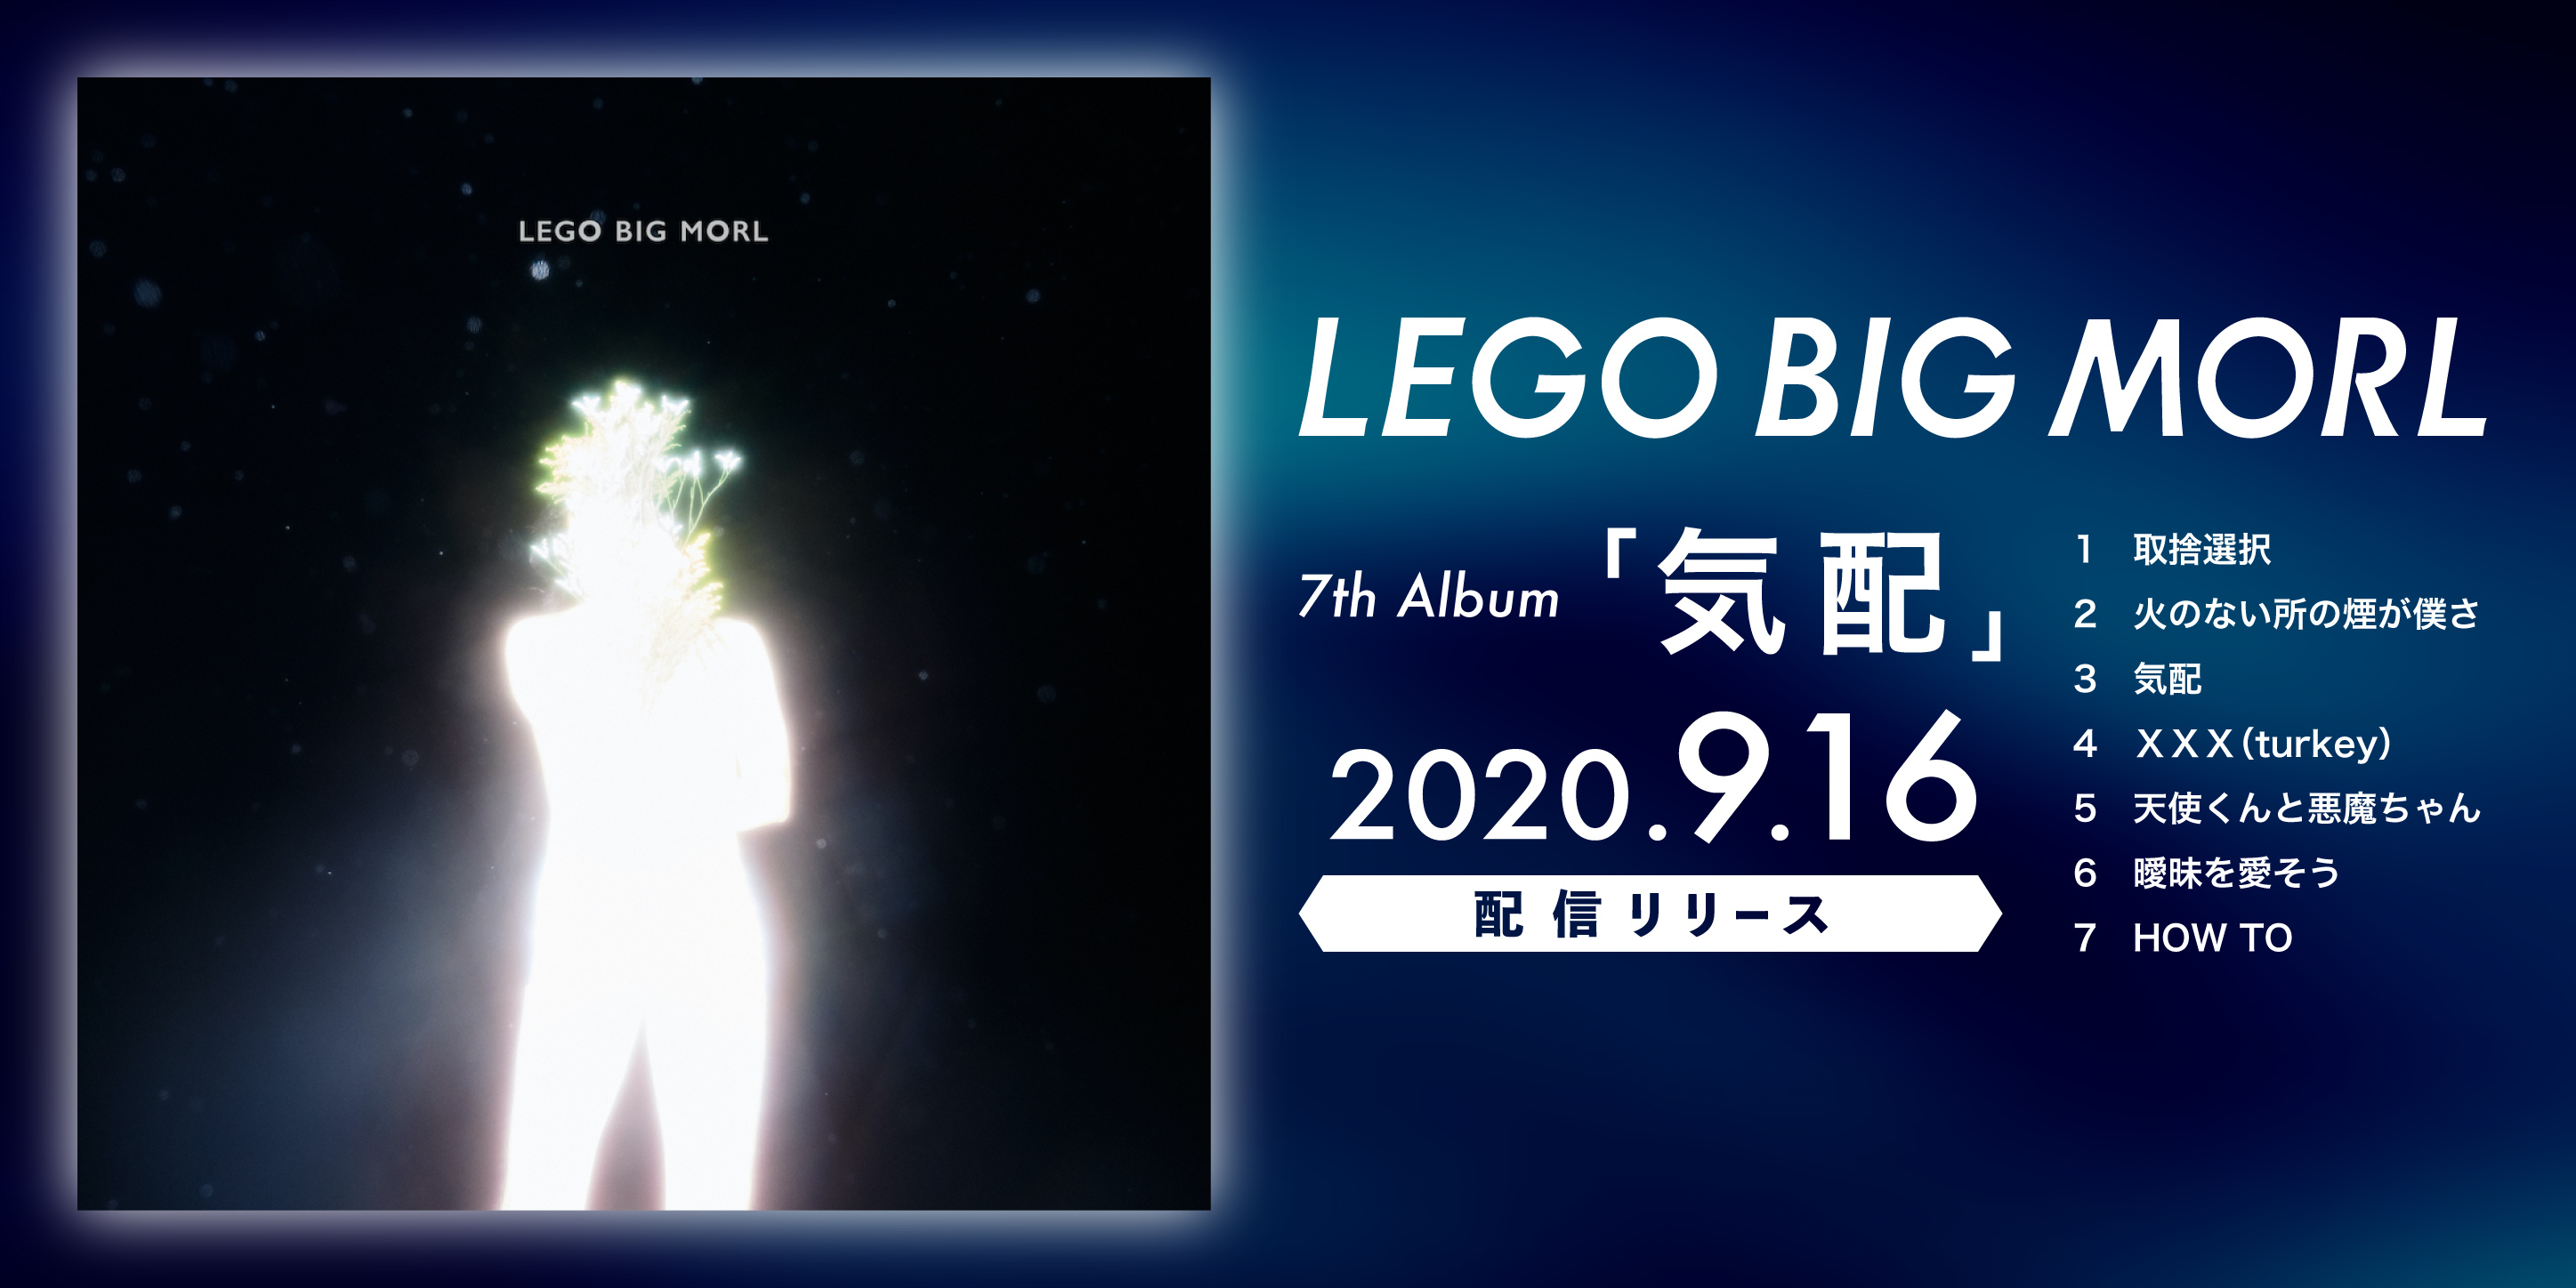 Lego_topbr_ver1